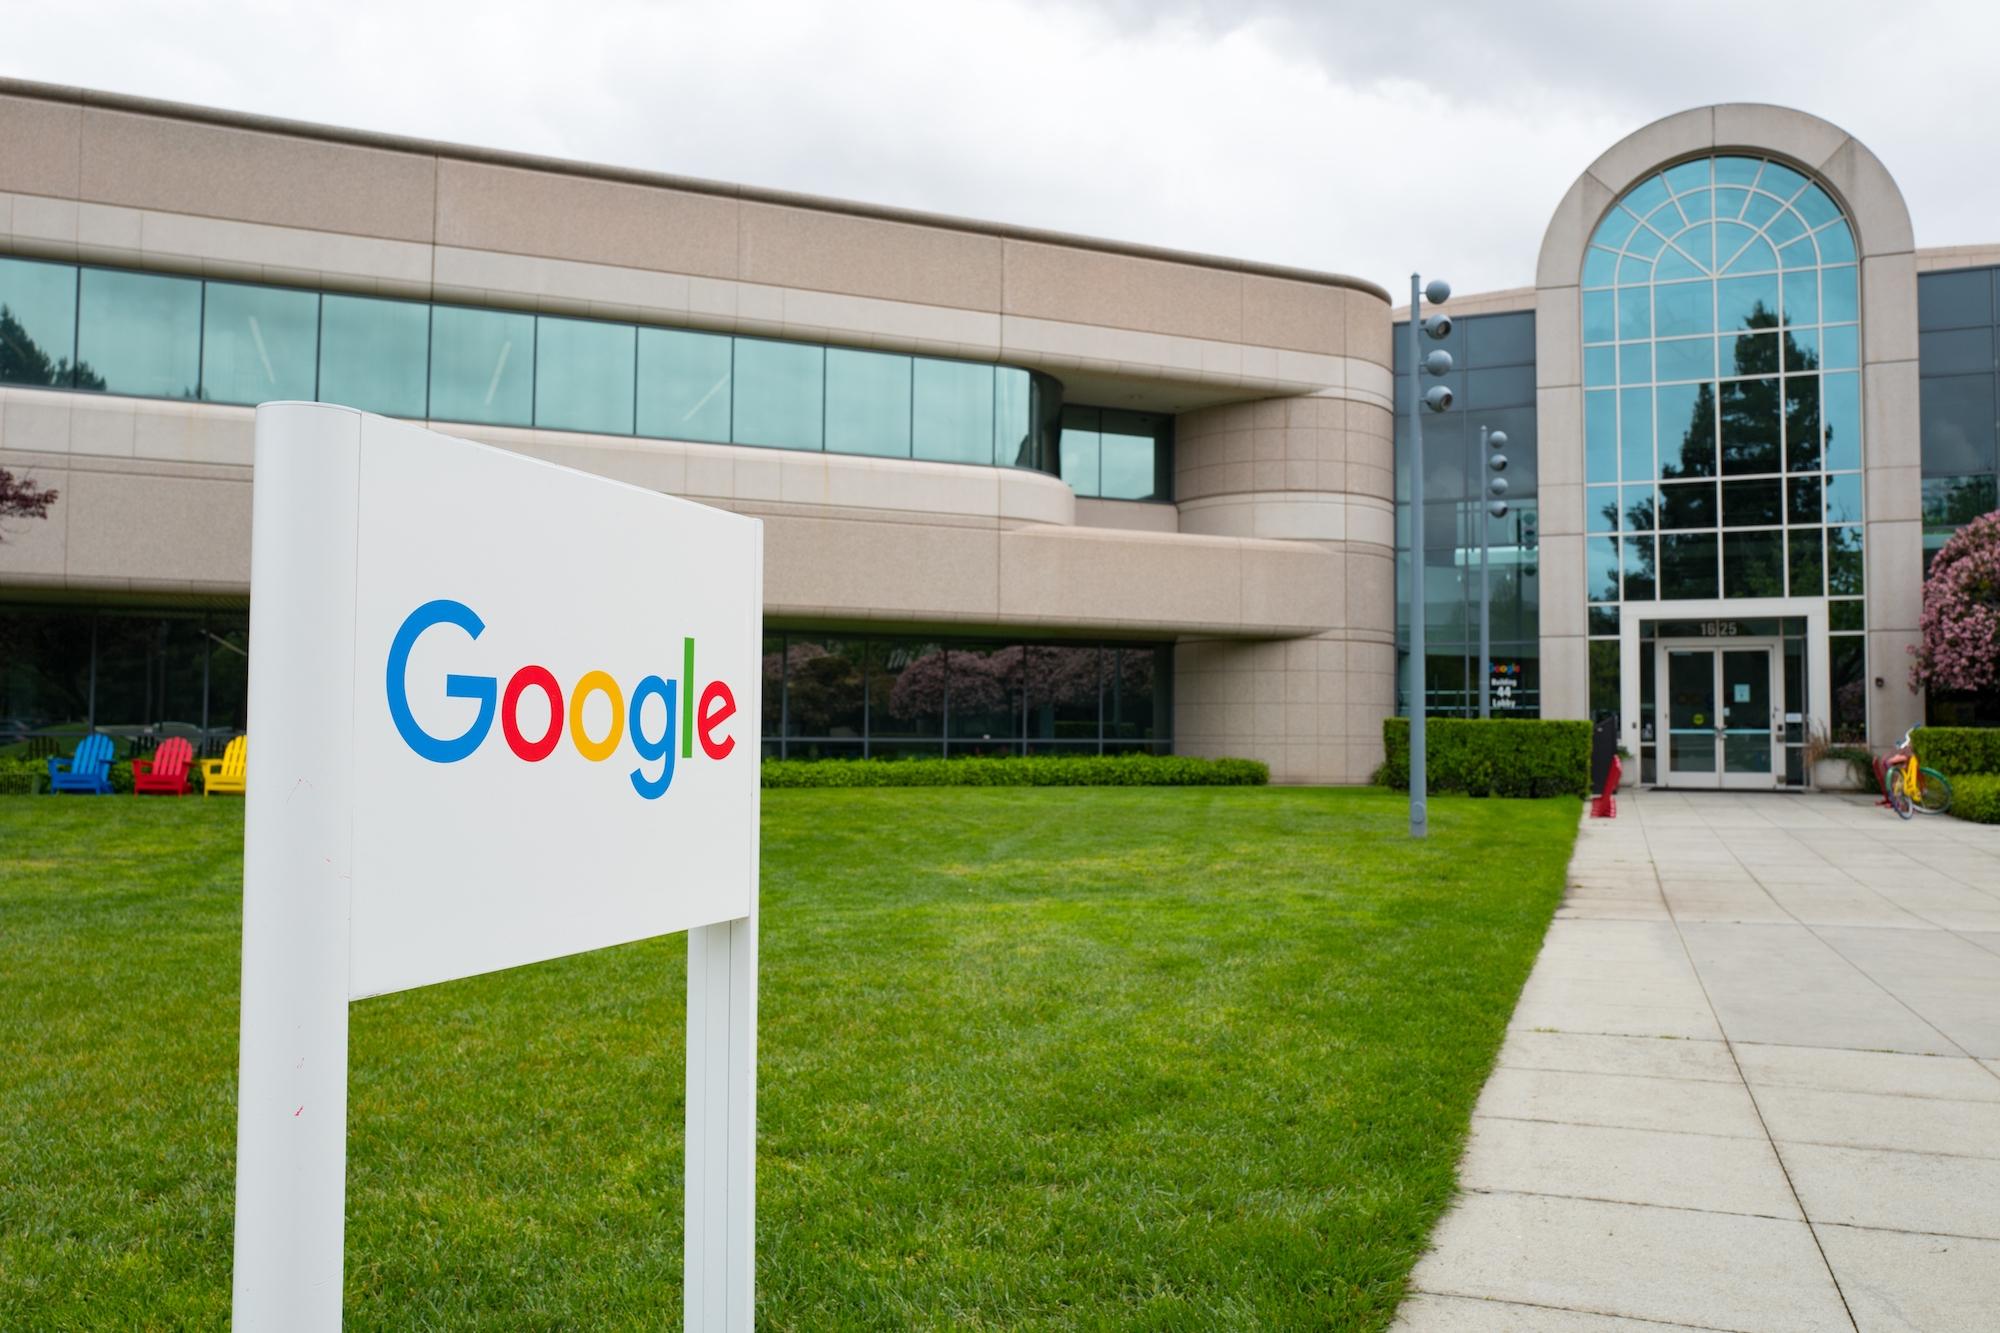 Employee's Anti-Diversity Manifesto Goes 'Internally Viral' at Google